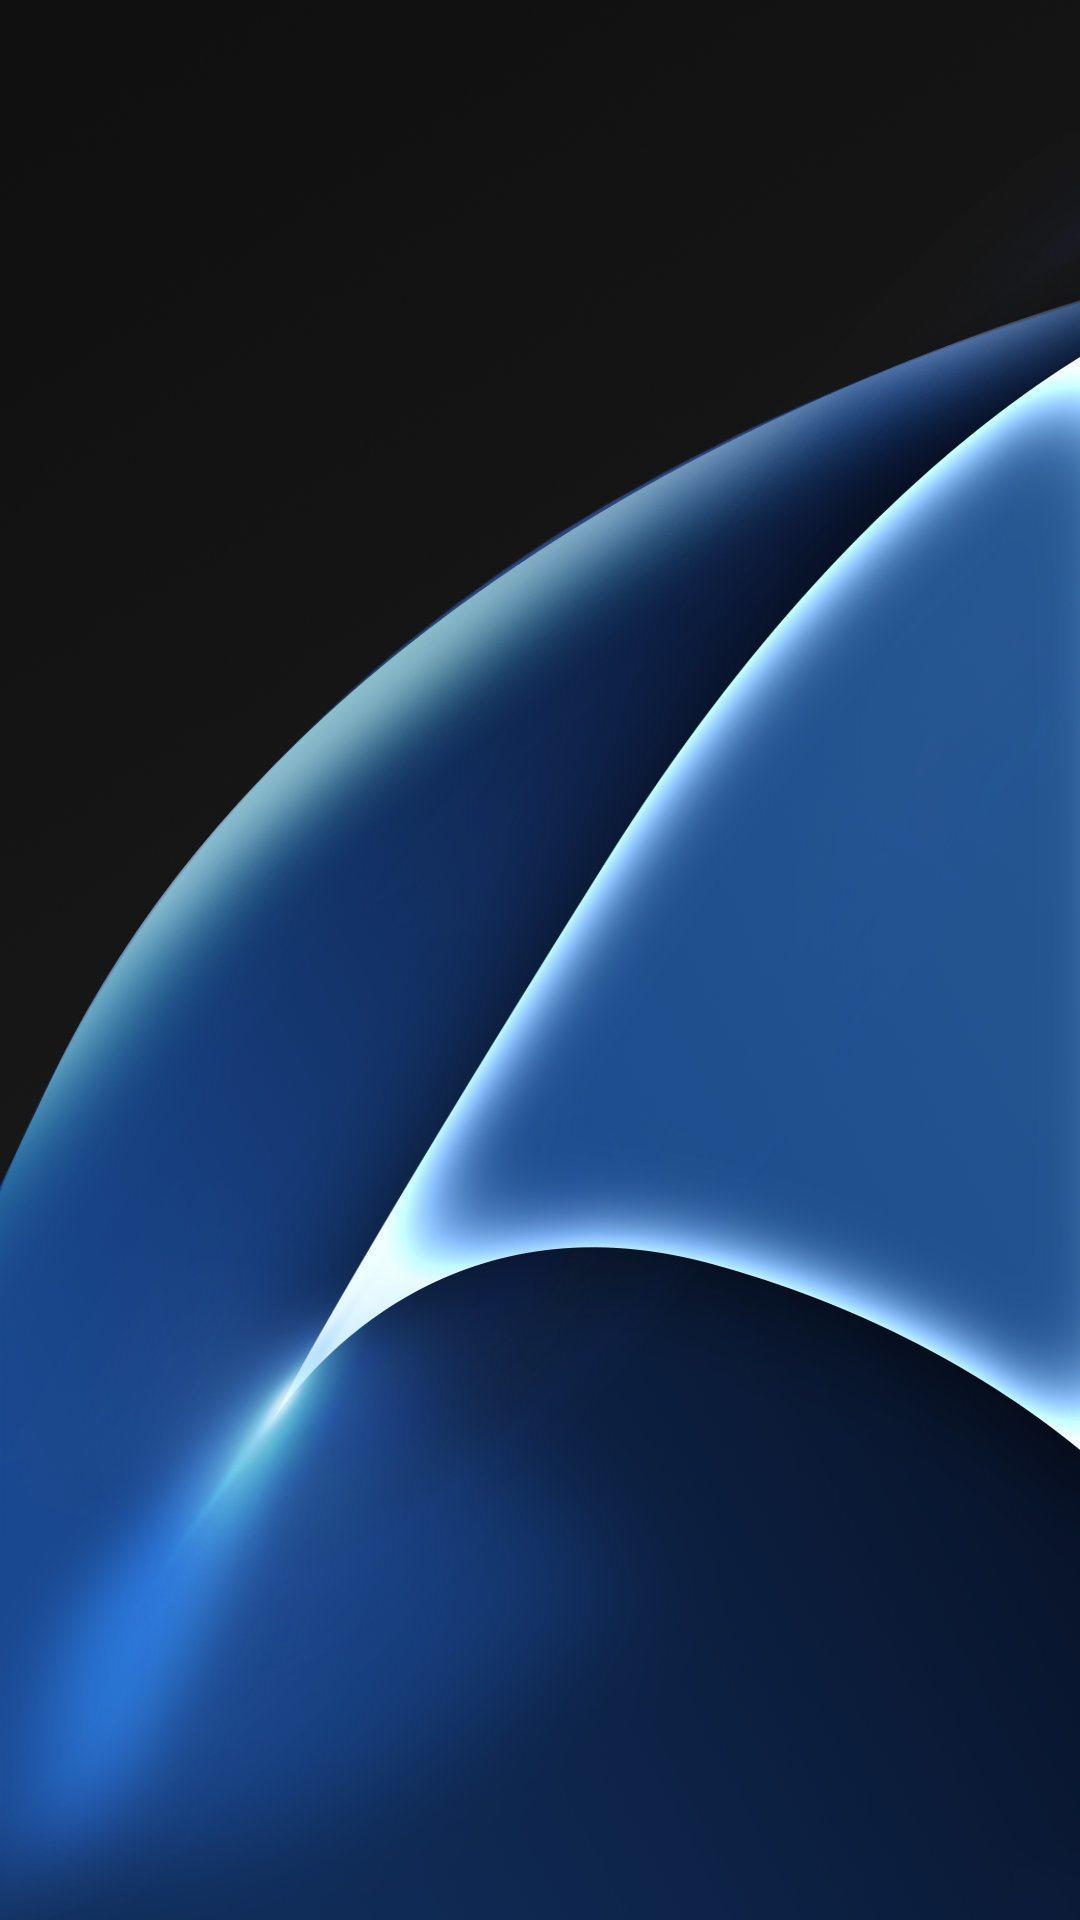 Samsung Galaxy S7 Wallpaper 001 1080x1920